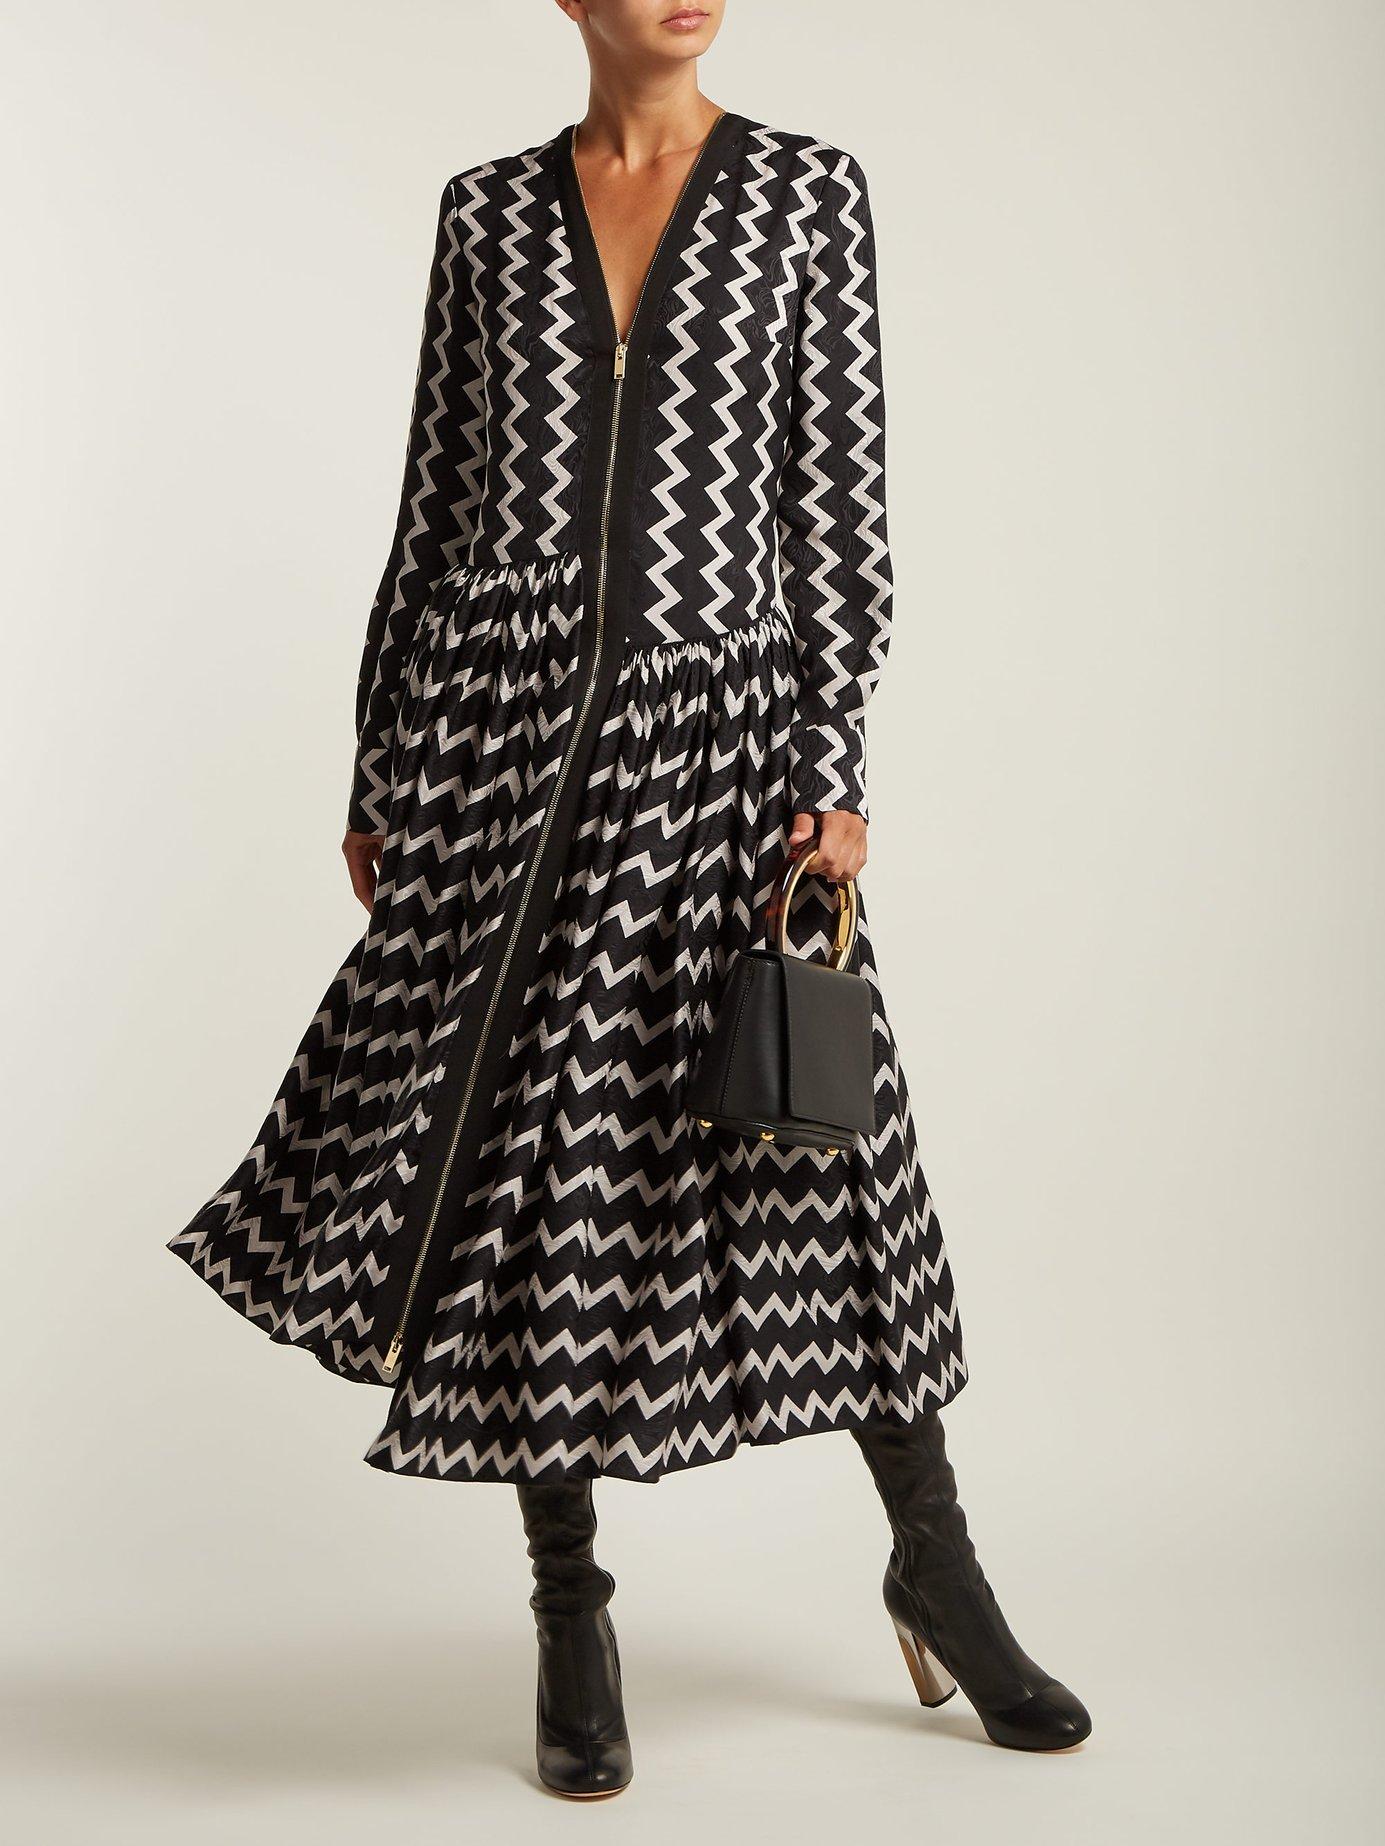 Zig-zag long-sleeved maxi dress by Stella Mccartney